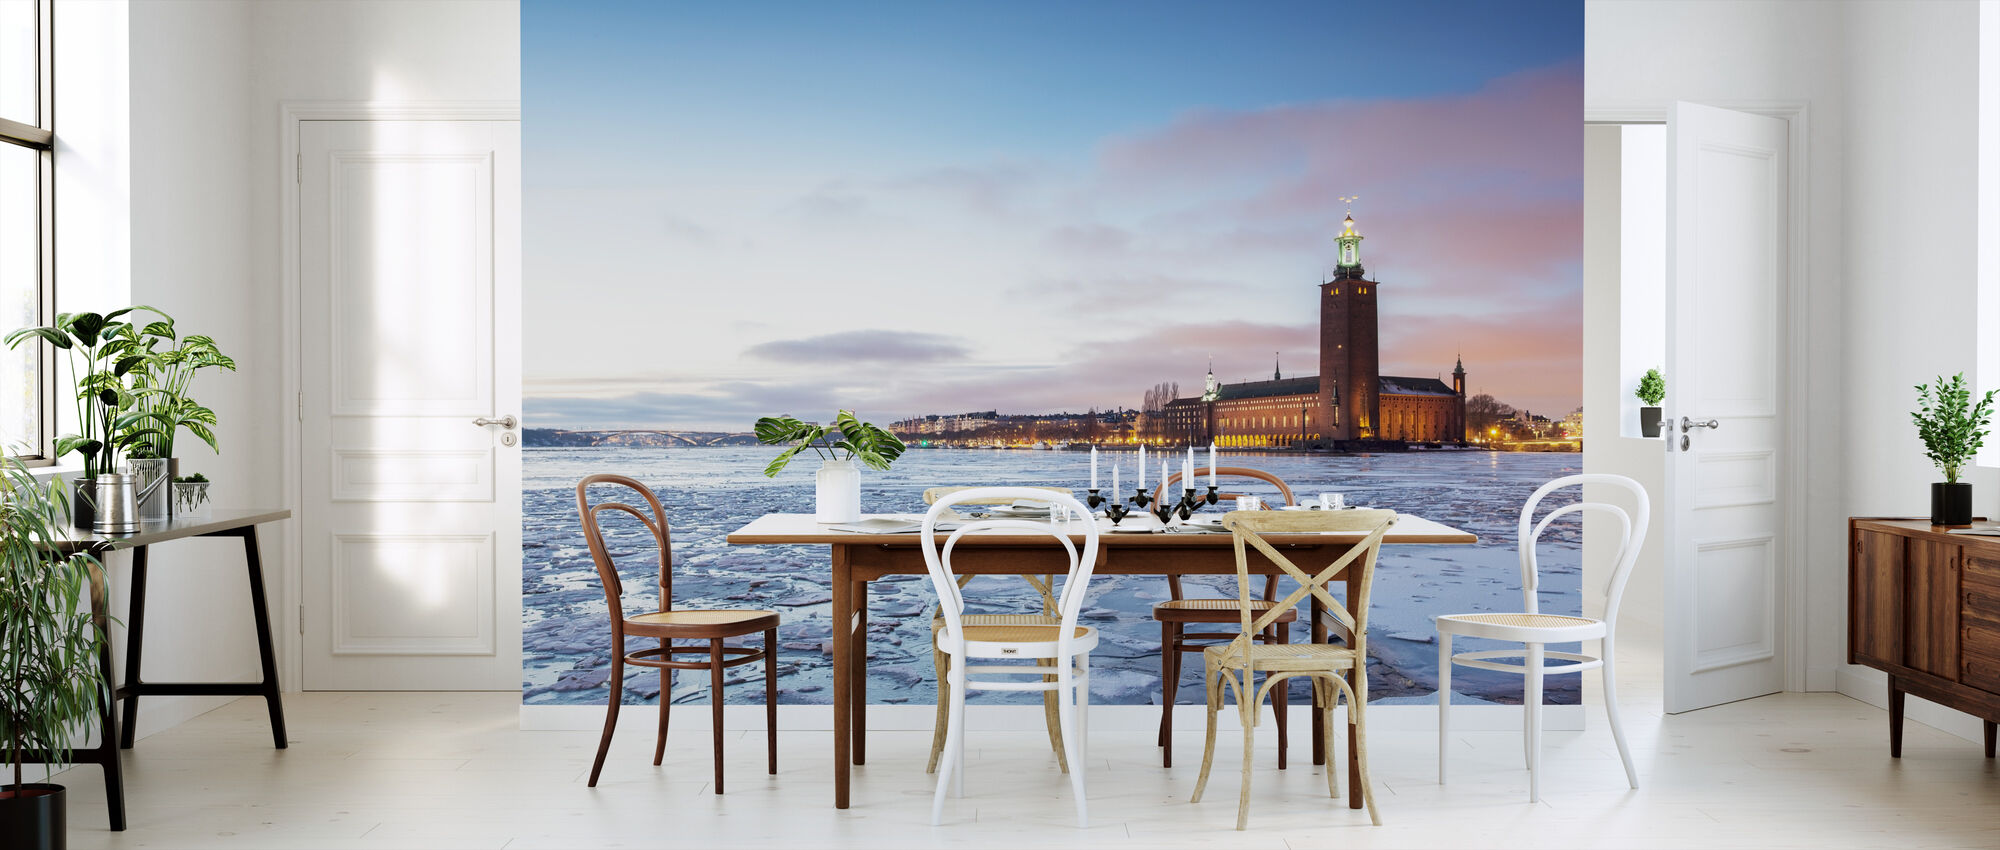 Stockholms stadshus på vintern - Tapet - Kök